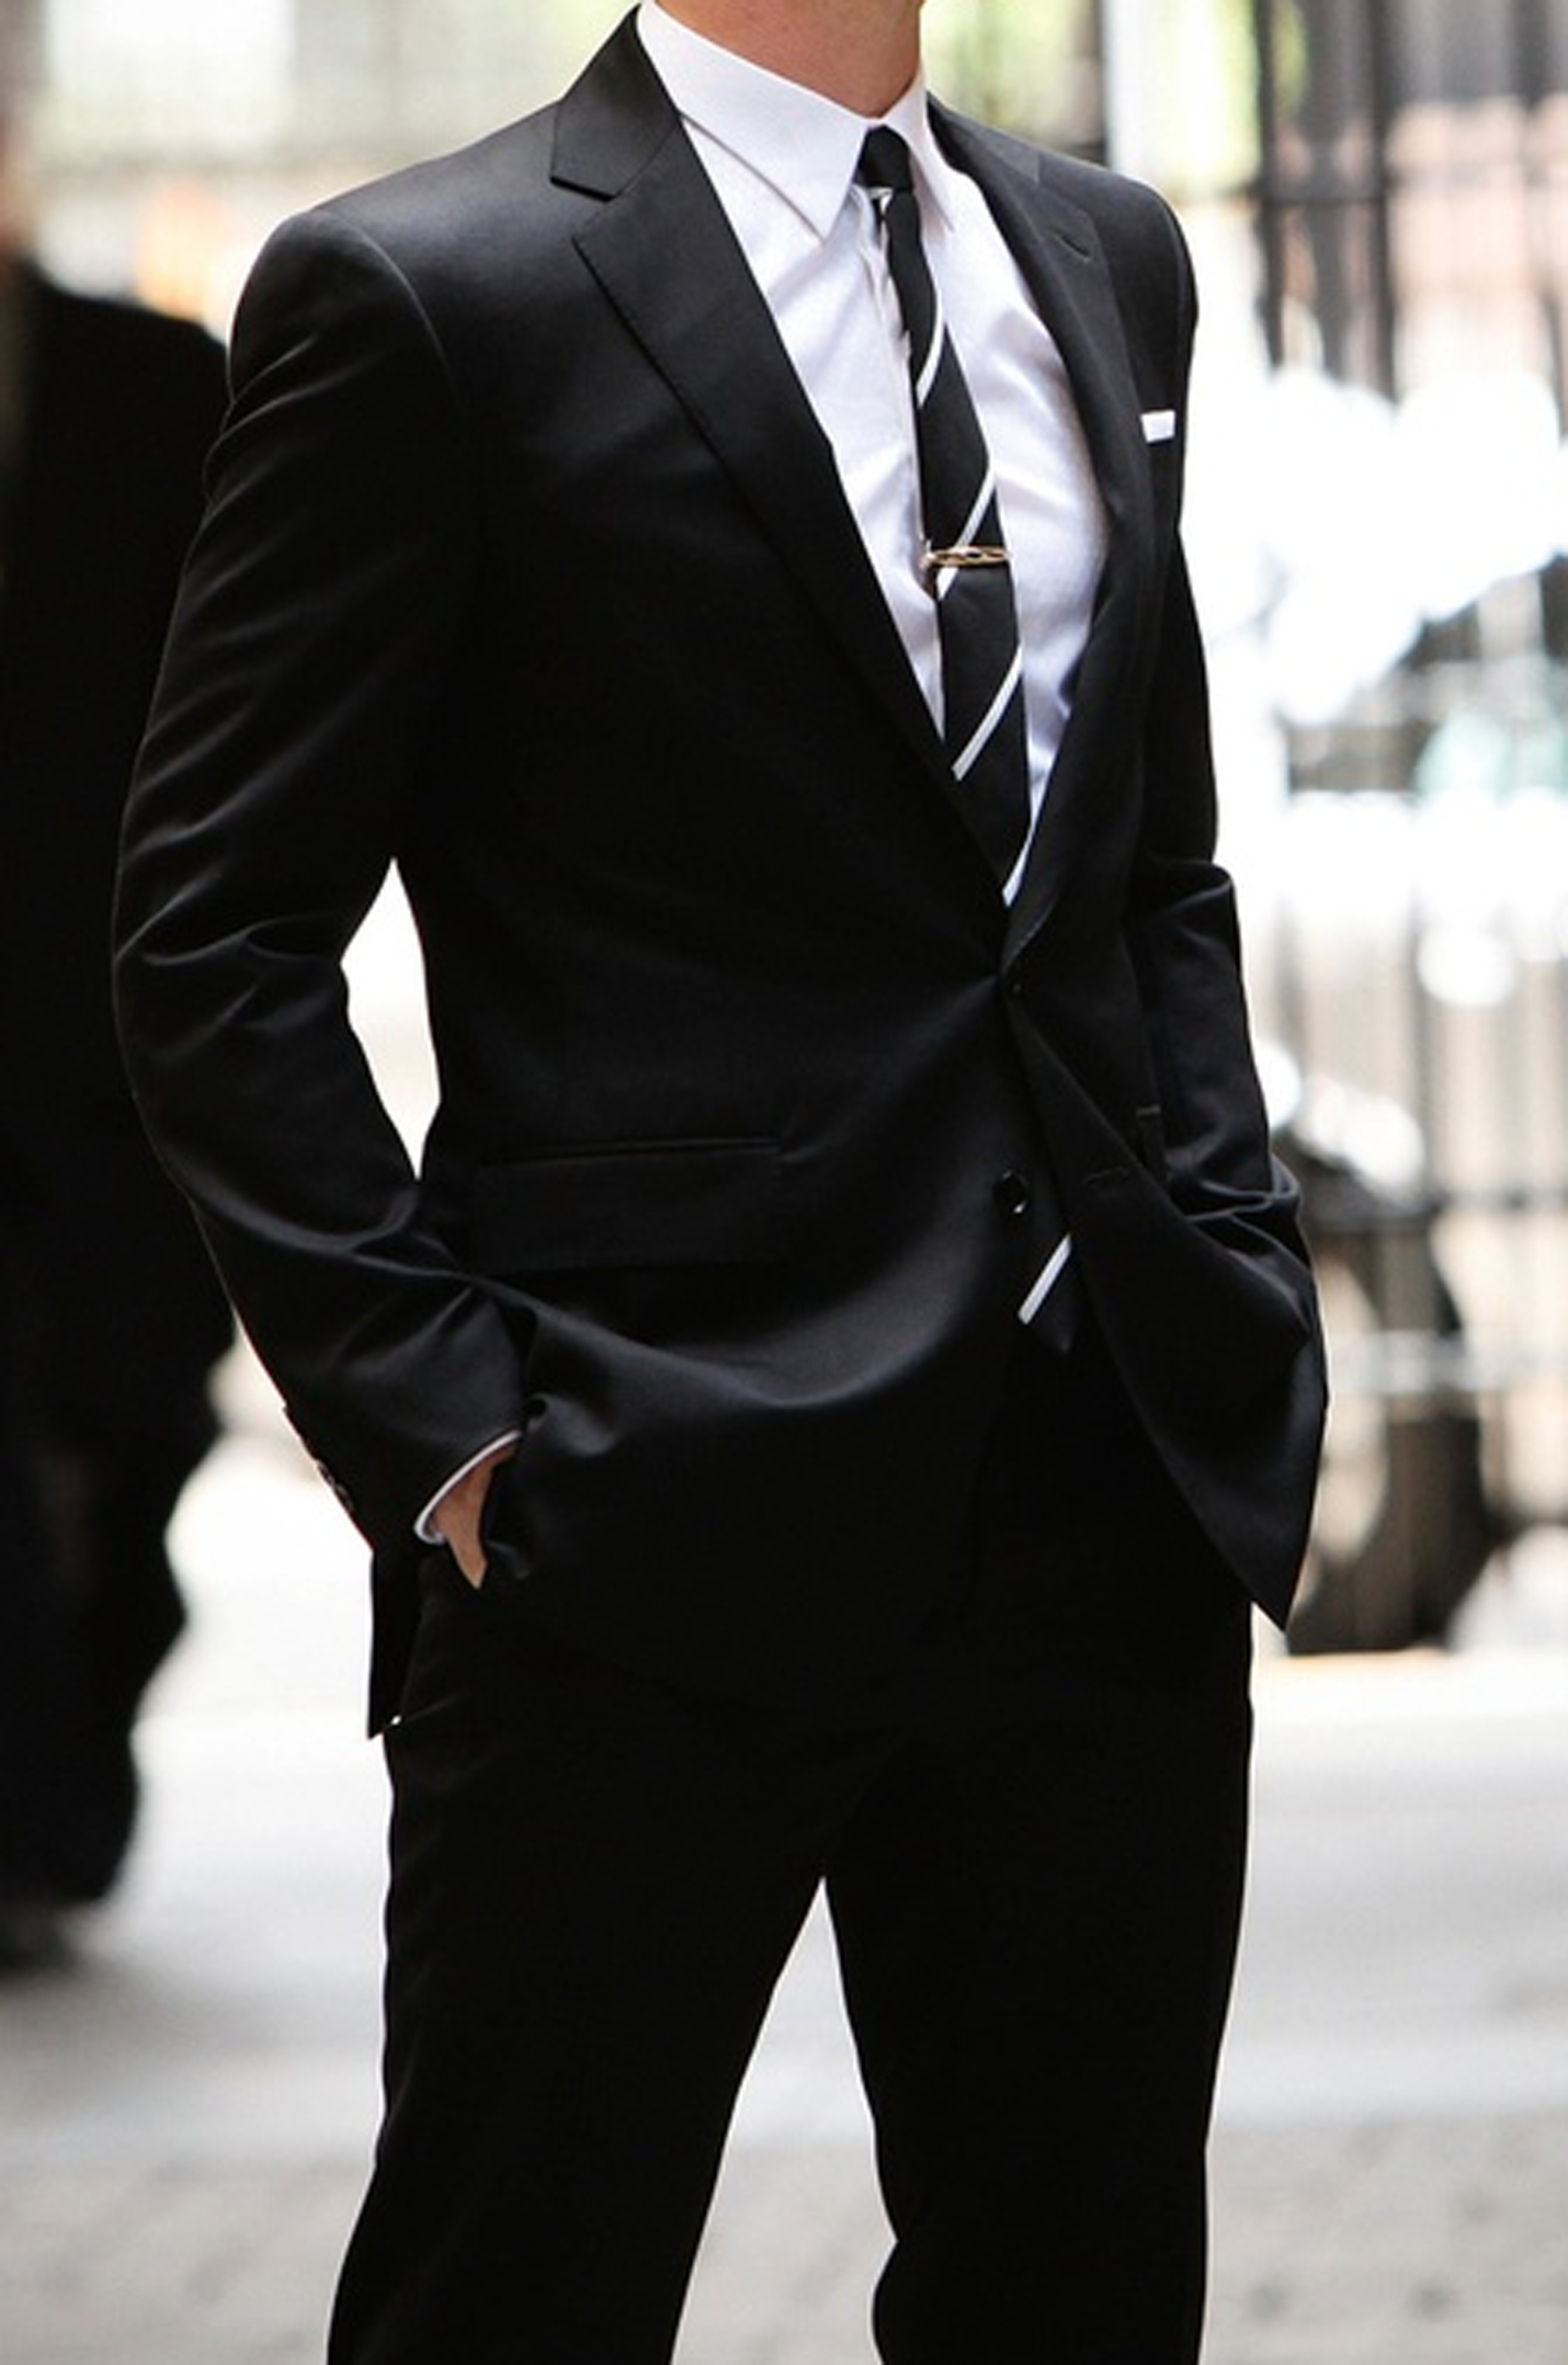 Dark Black Suit | My Dress Tip